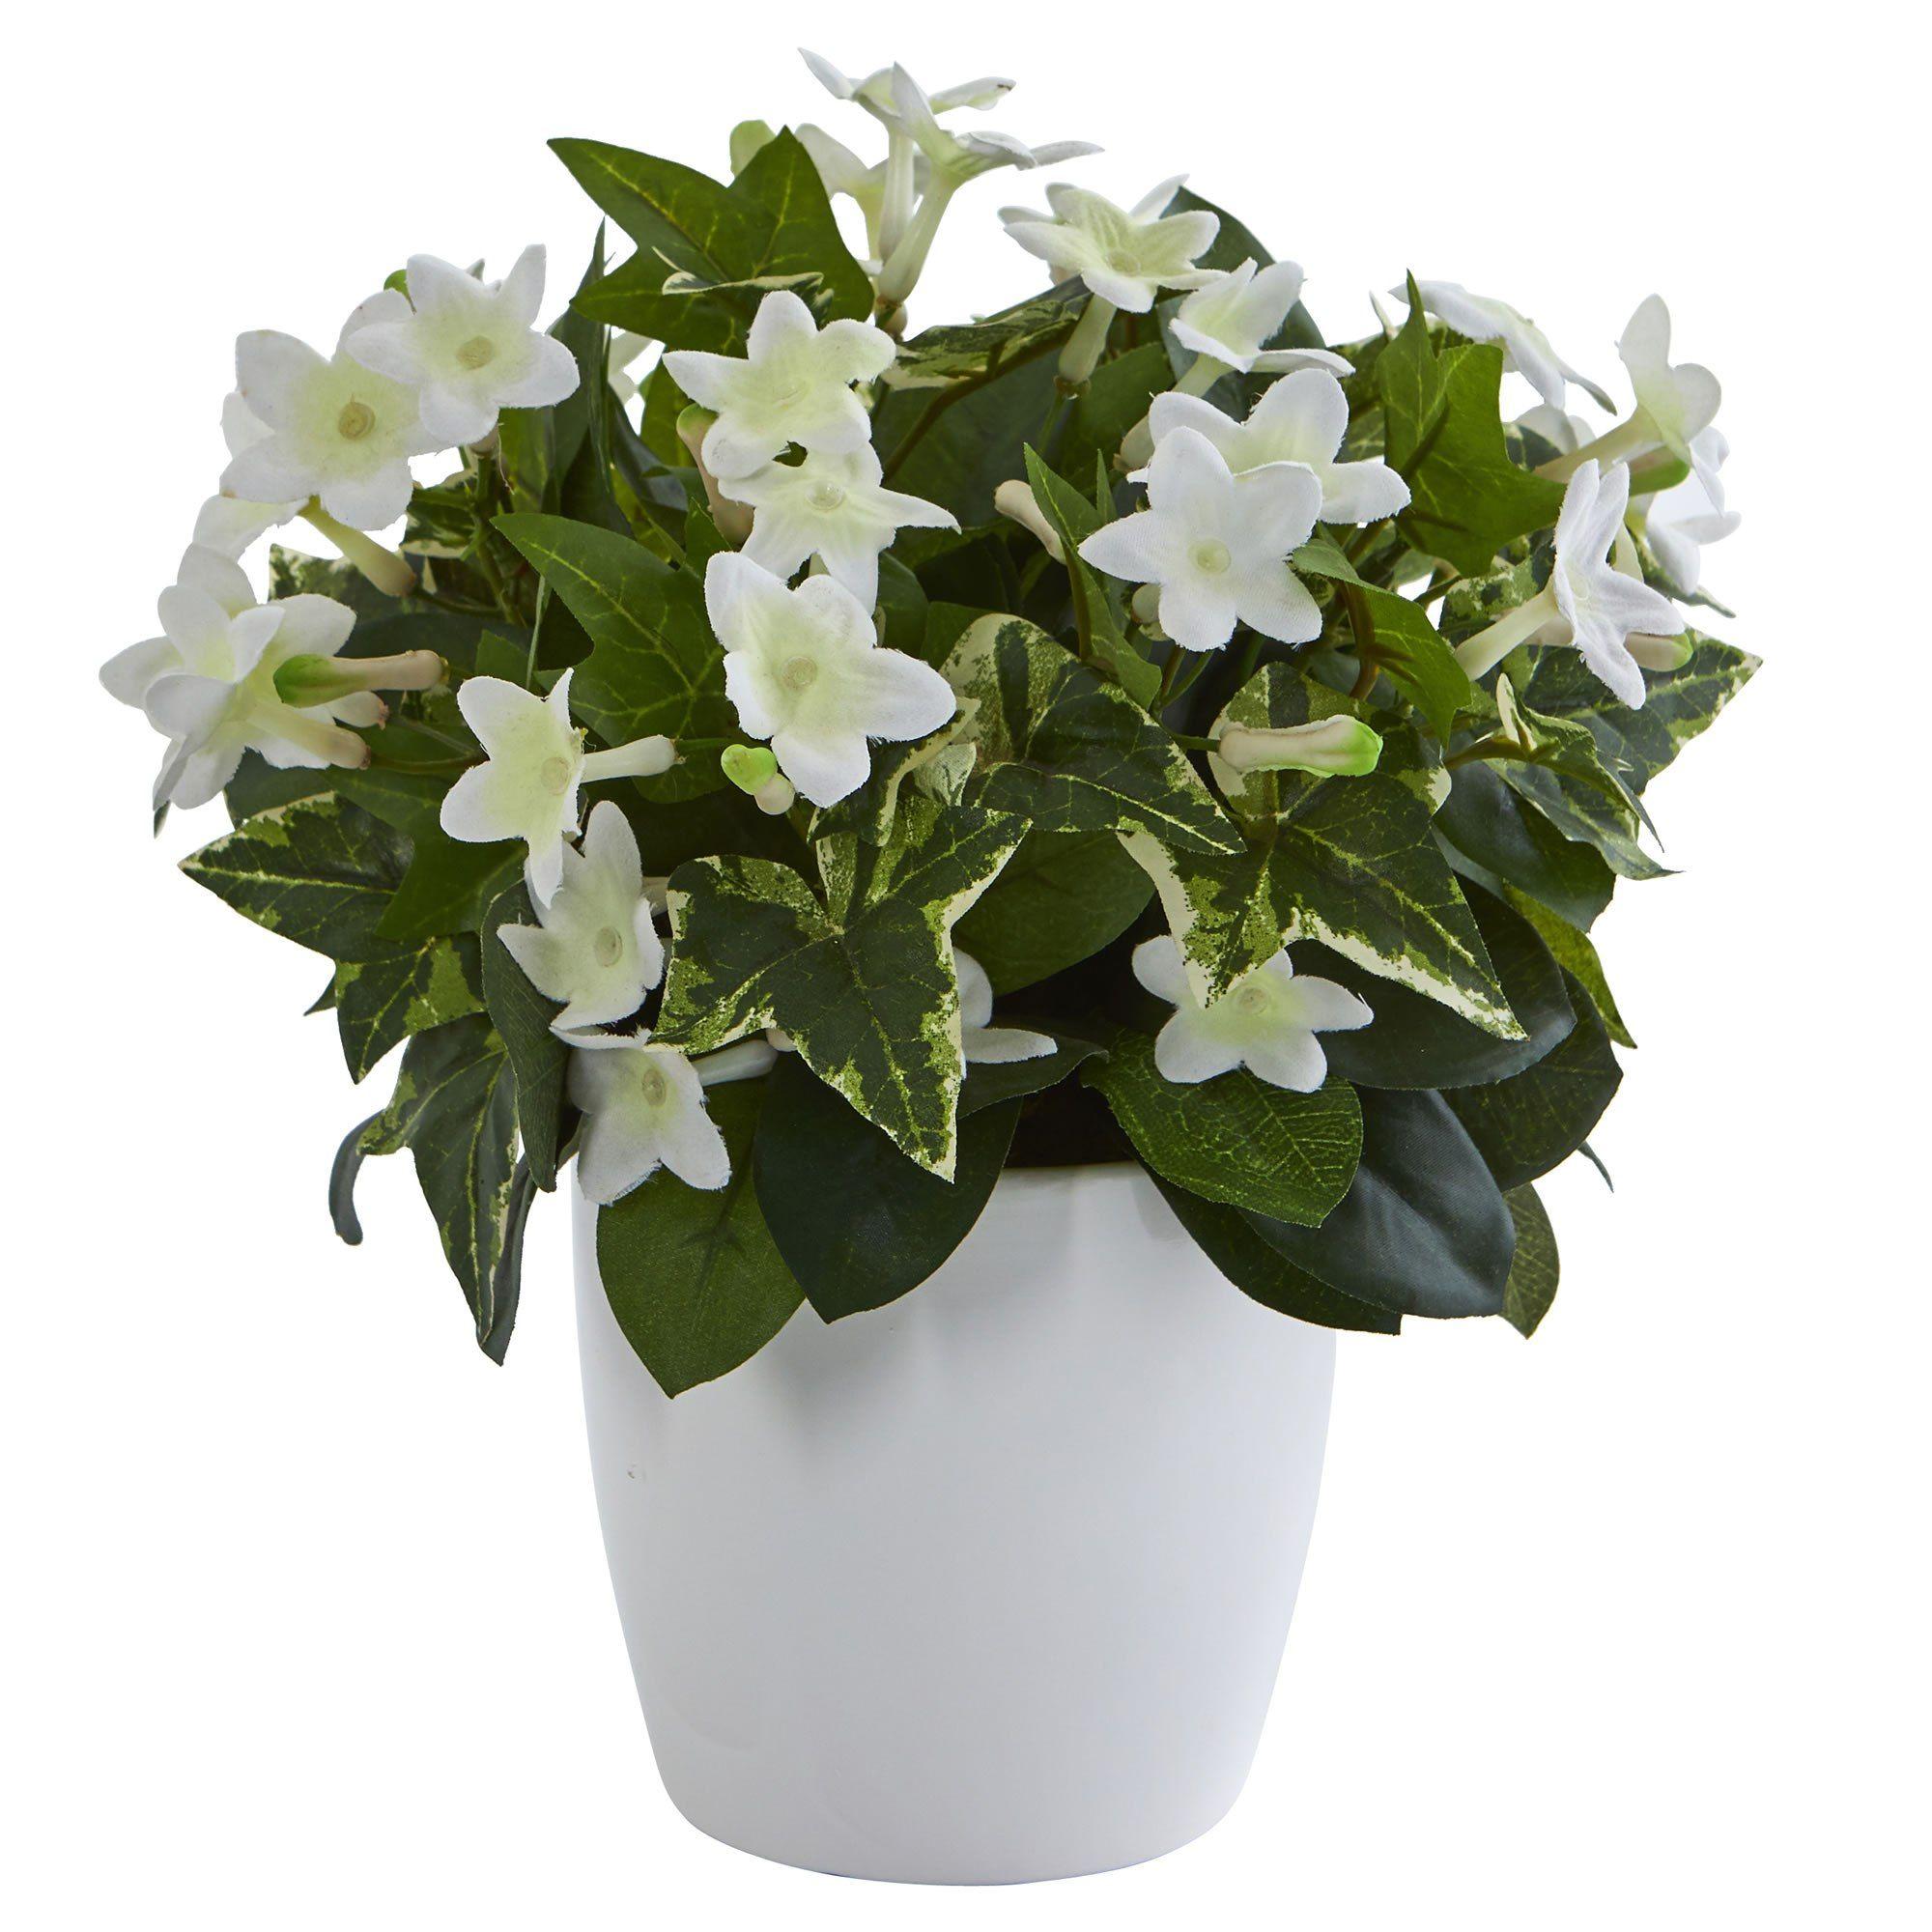 Stephanotis Artificial Plant In White Vase White Vases Artificial Plants White Planters